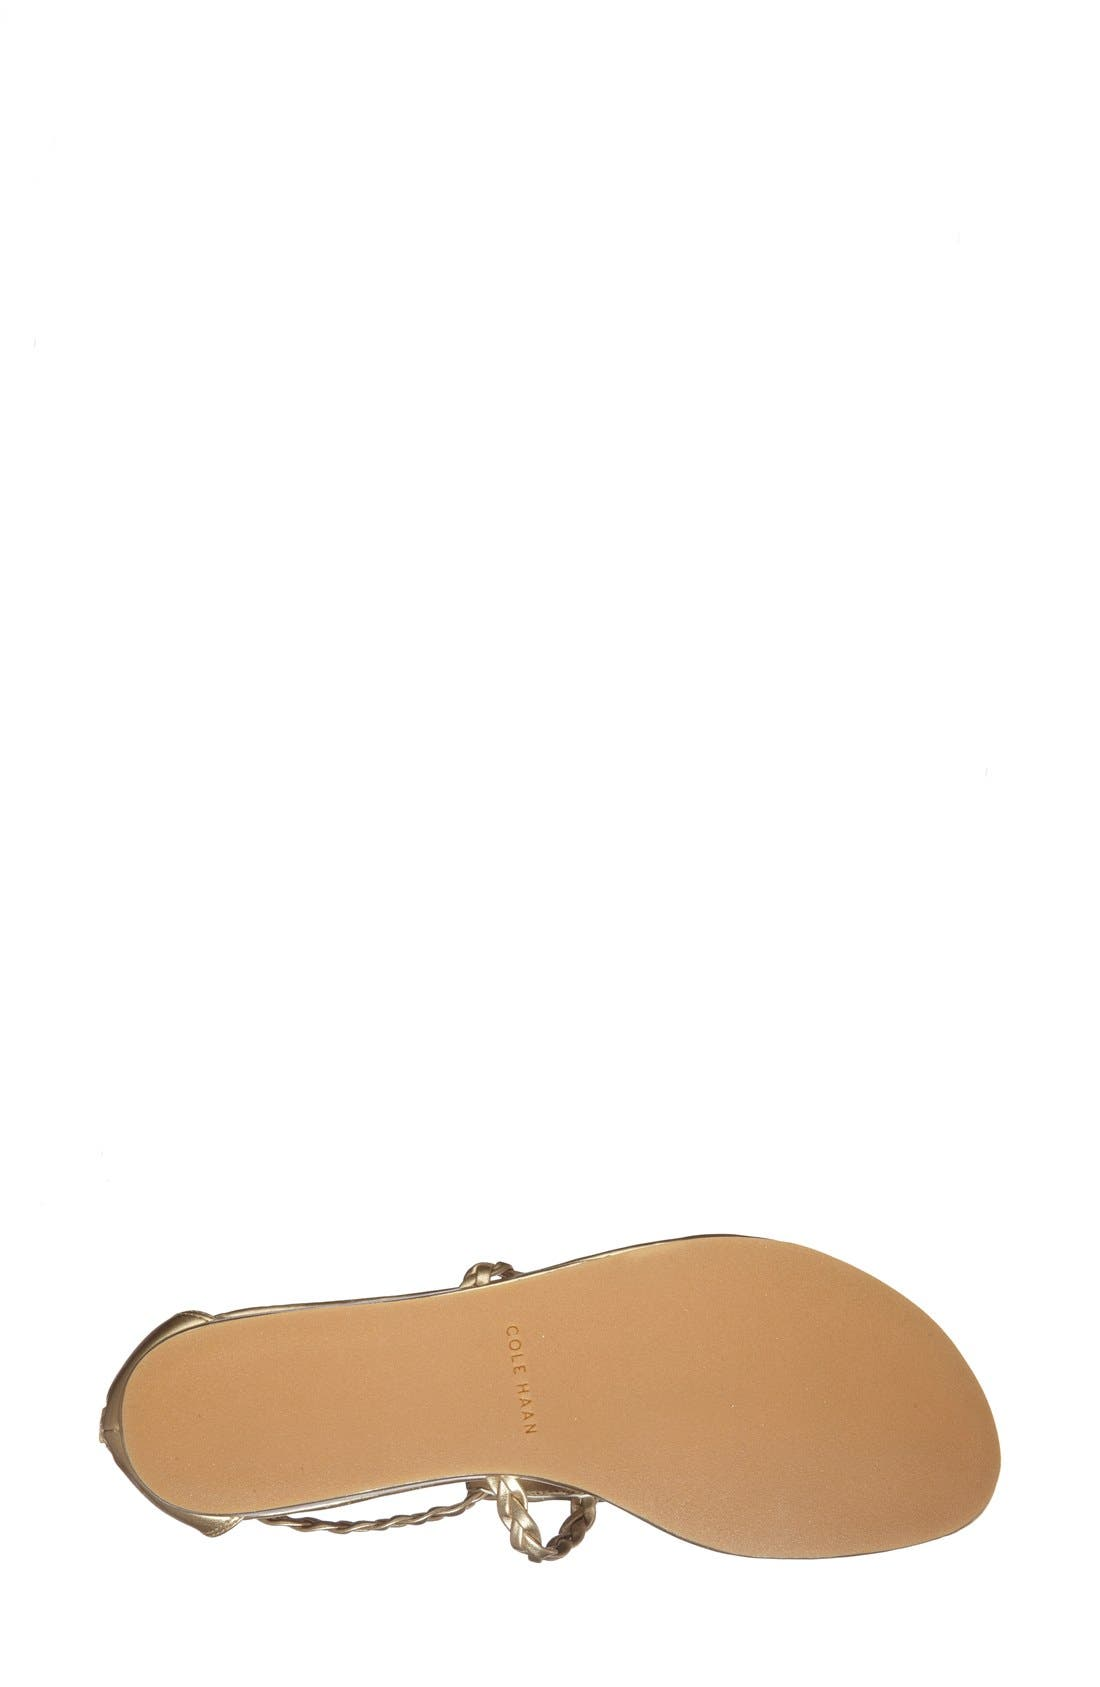 Alternate Image 3  - Cole Haan 'Abbe' Sandal (Women)